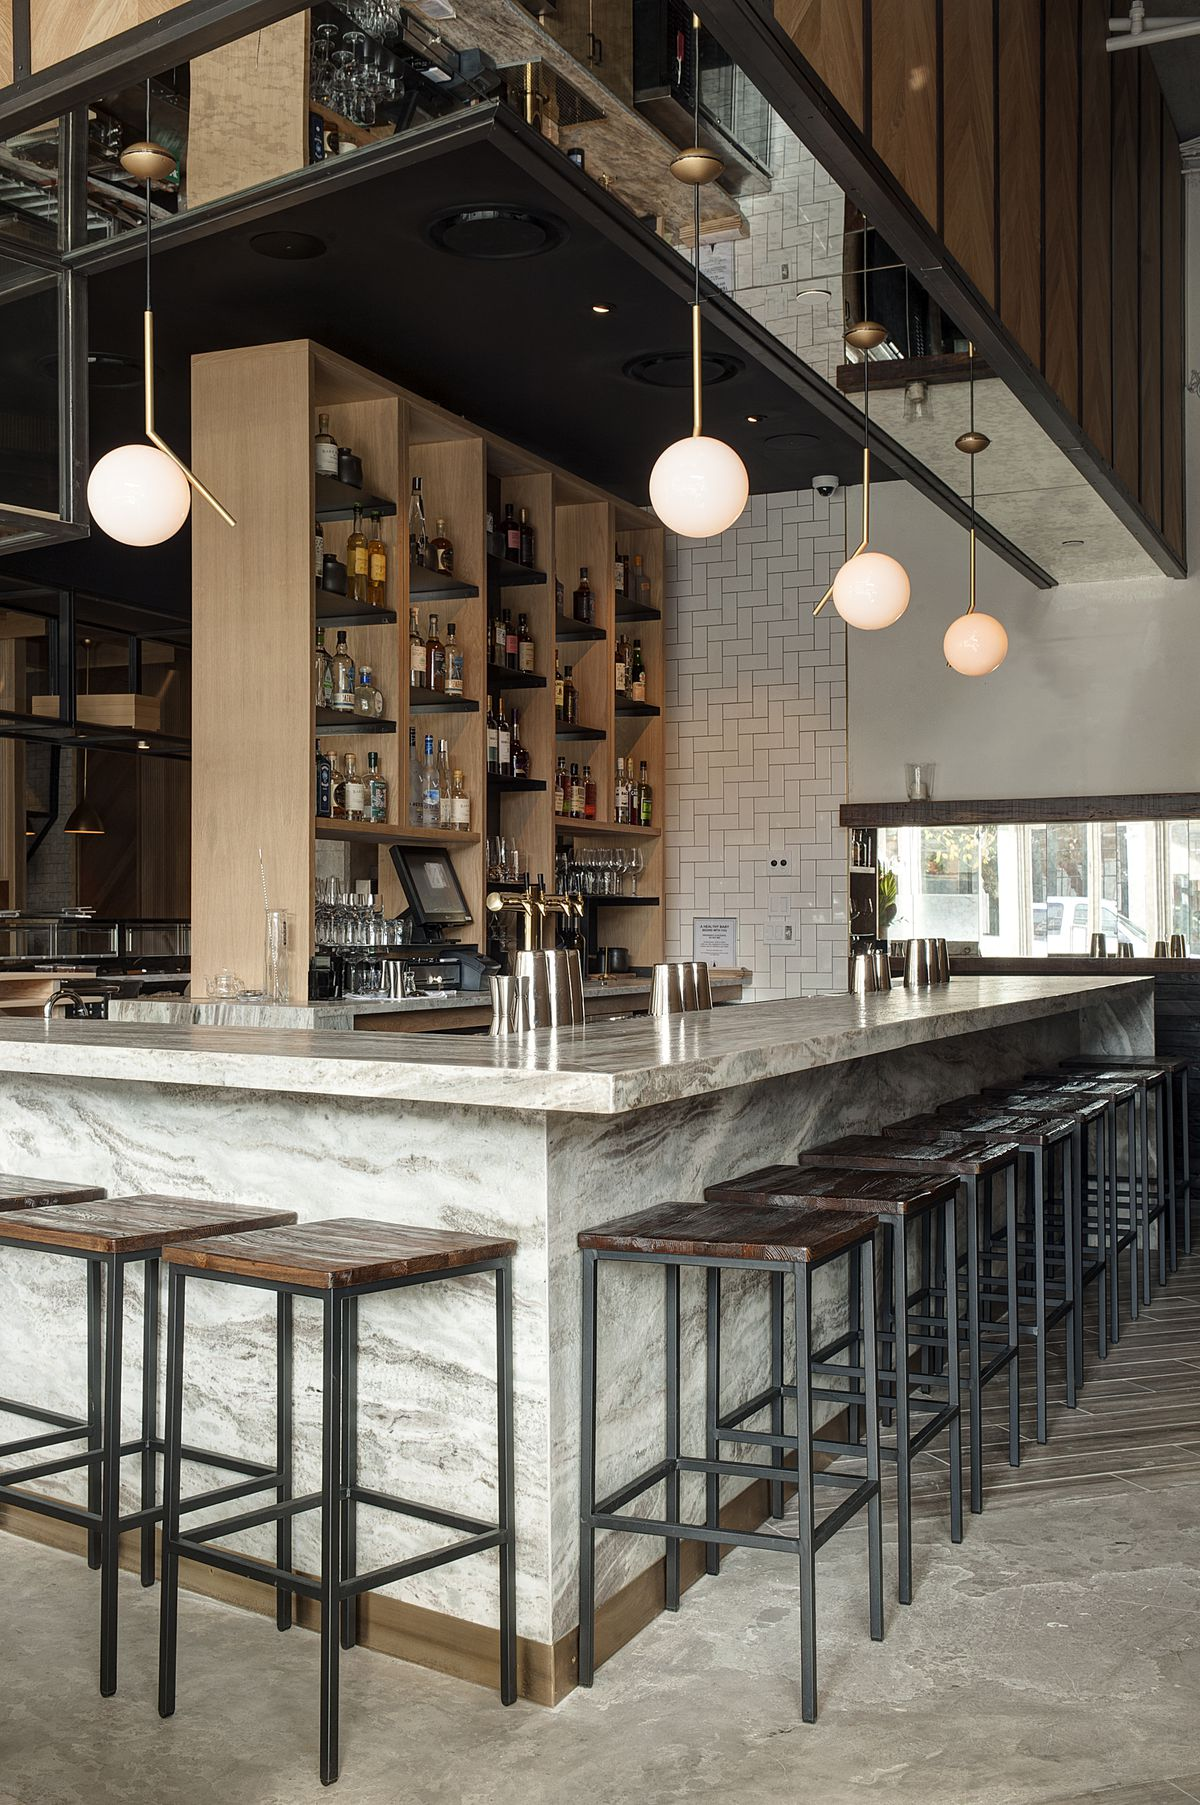 Tuna Bar in Old City Philadelphia - for Eater